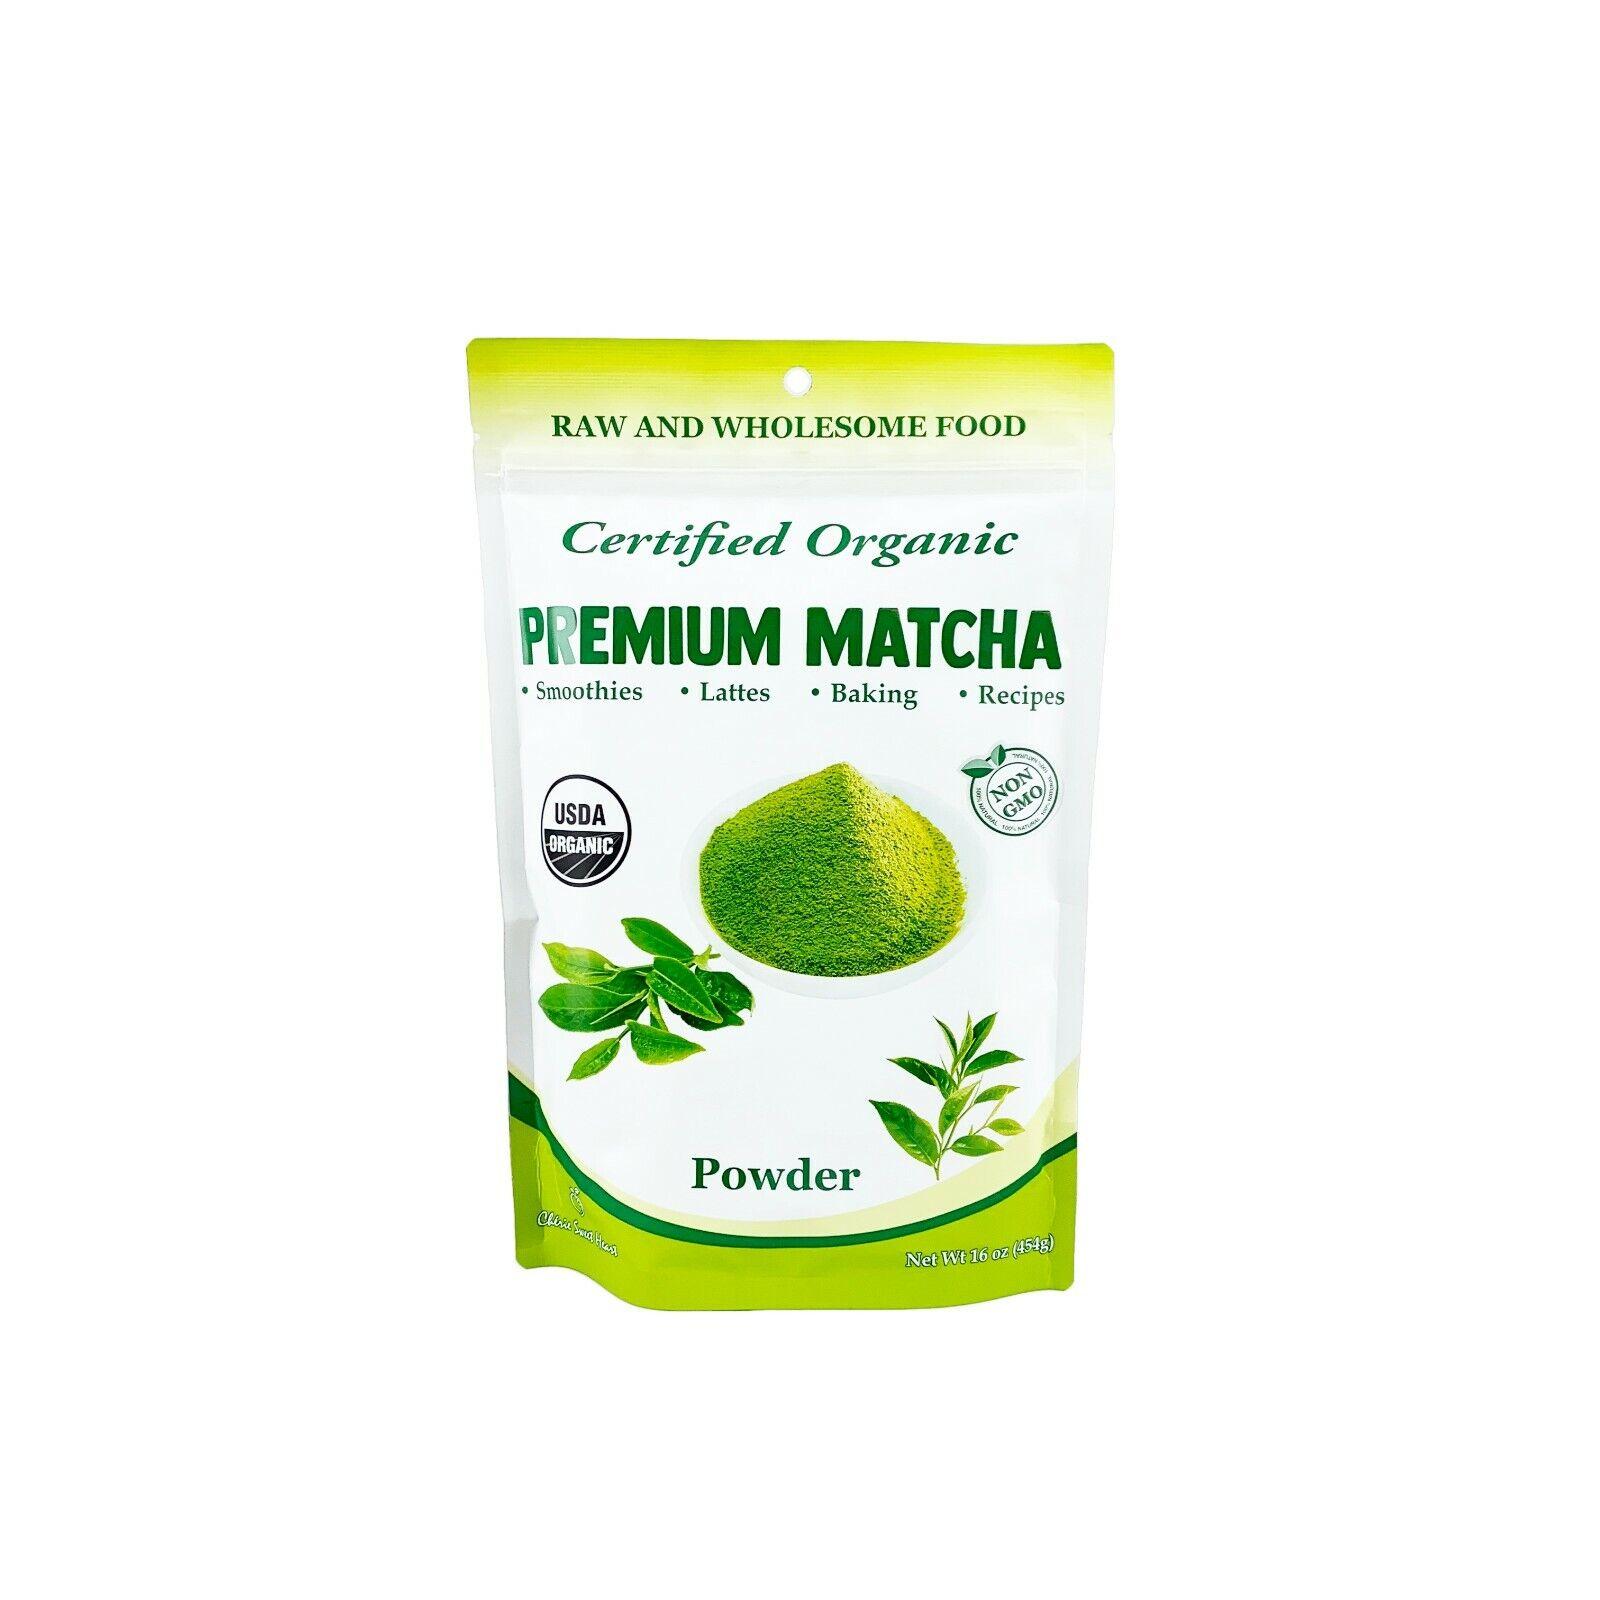 USDA Certified Organic Matcha Green Tea Powder, 1 LB Bag